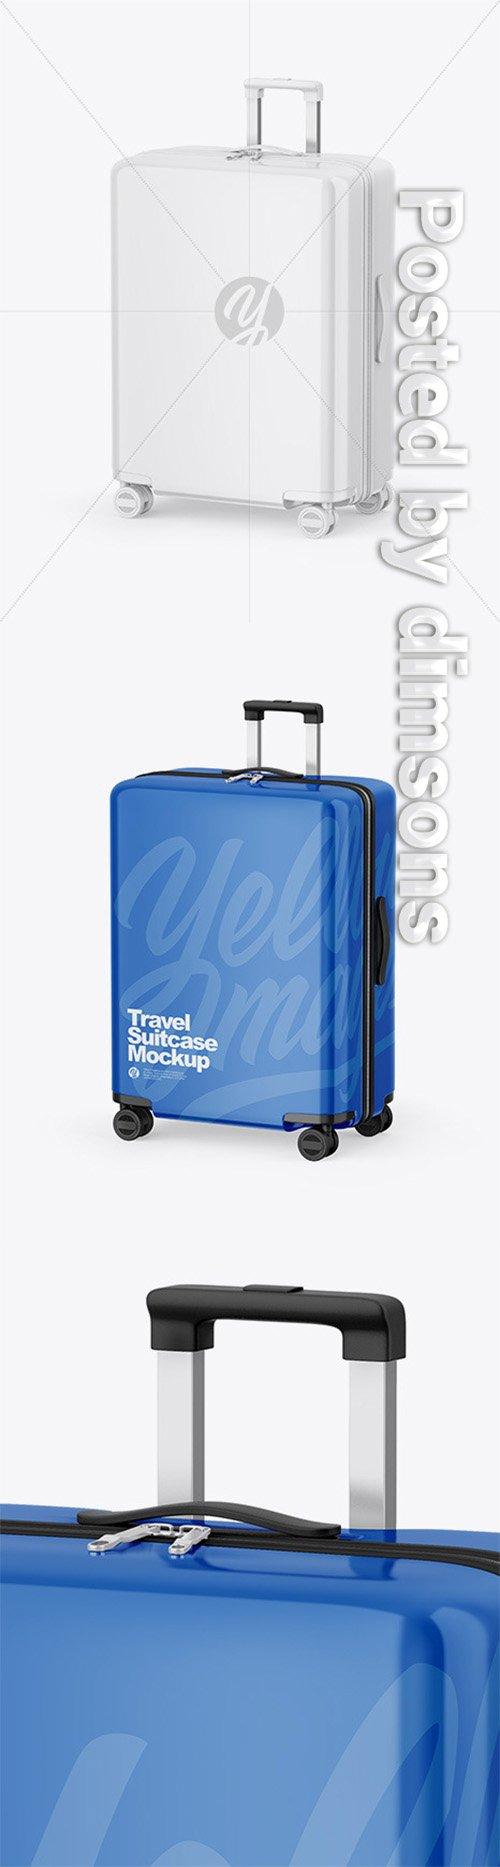 Glossy Travel Suitcase Mockup 65014 TIF